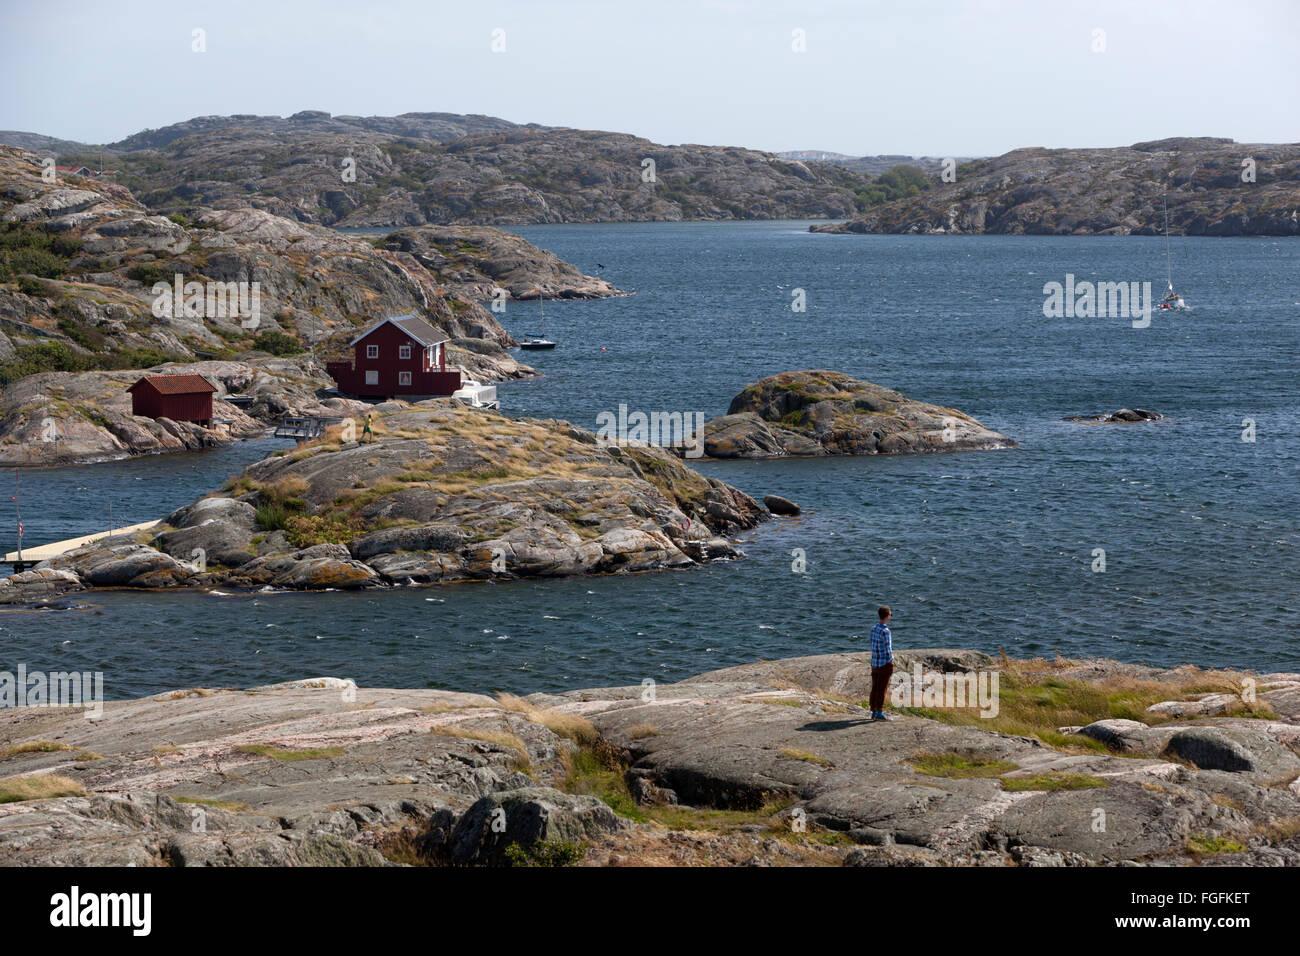 Yacht sailing through archipelago, Skärhamn, Tjörn, Bohuslän Coast, southwest Sweden, Sweden, Scandinavia, - Stock Image